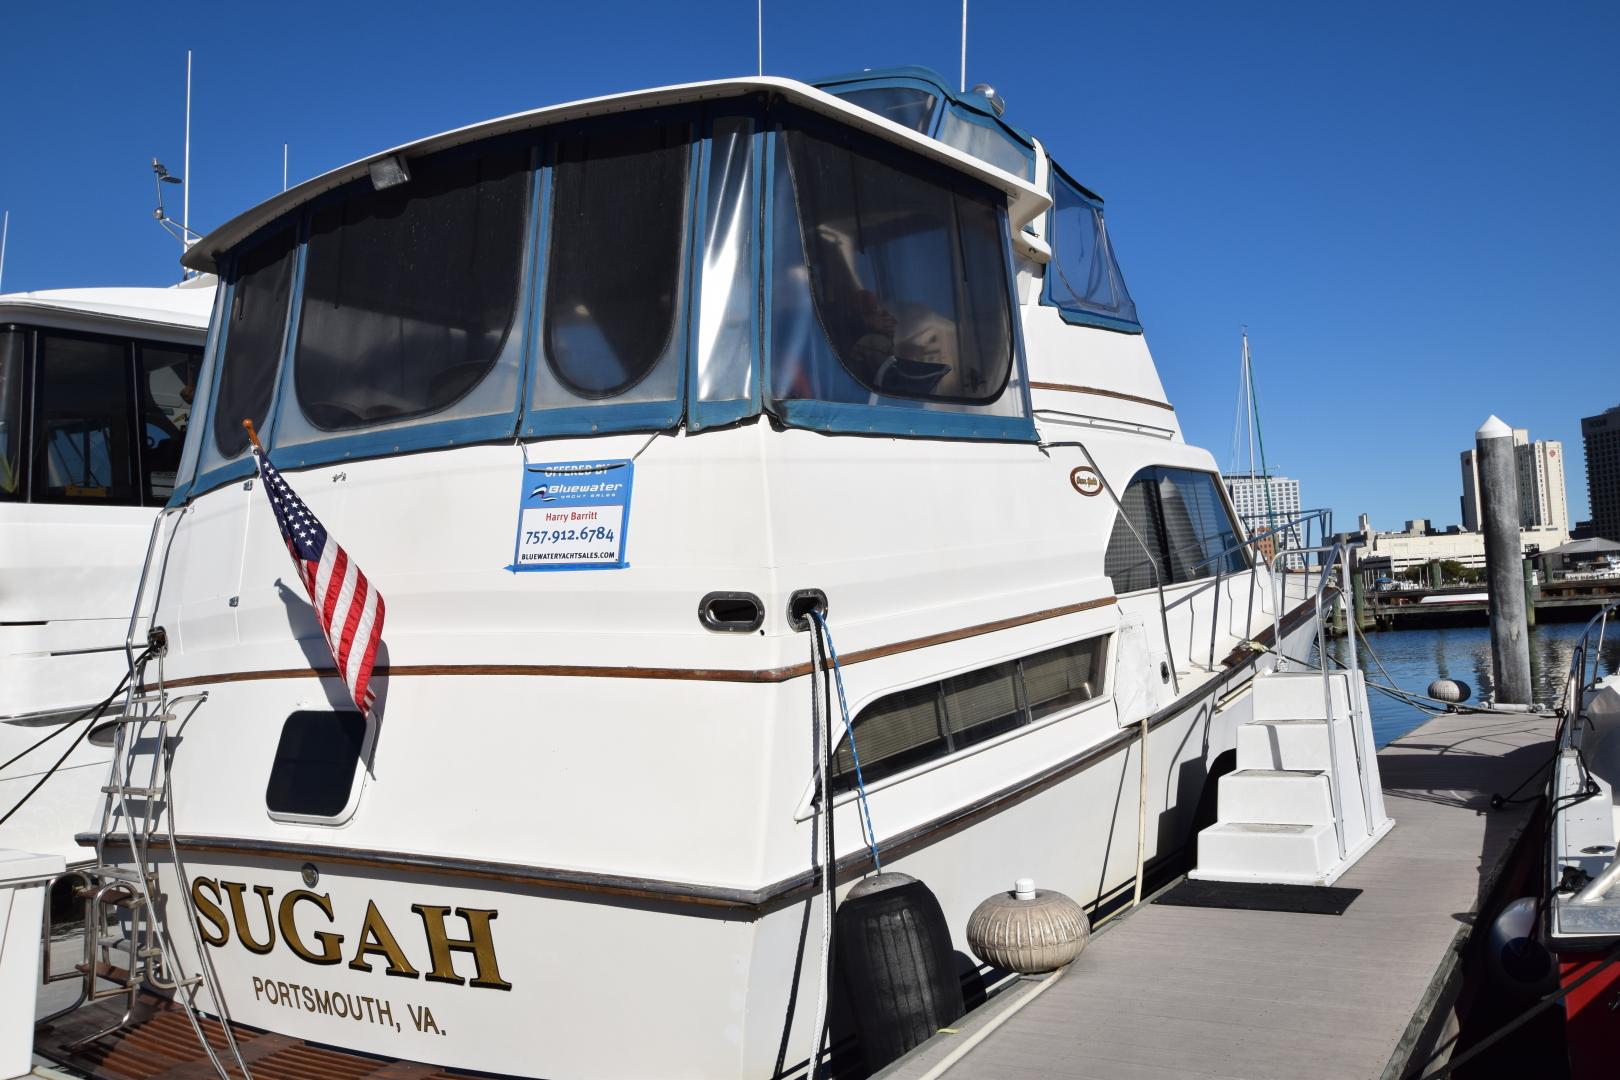 Ocean Yachts-46 Sunliner 1986-Sugah Portsmouth-Virginia-United States-1555552 | Thumbnail